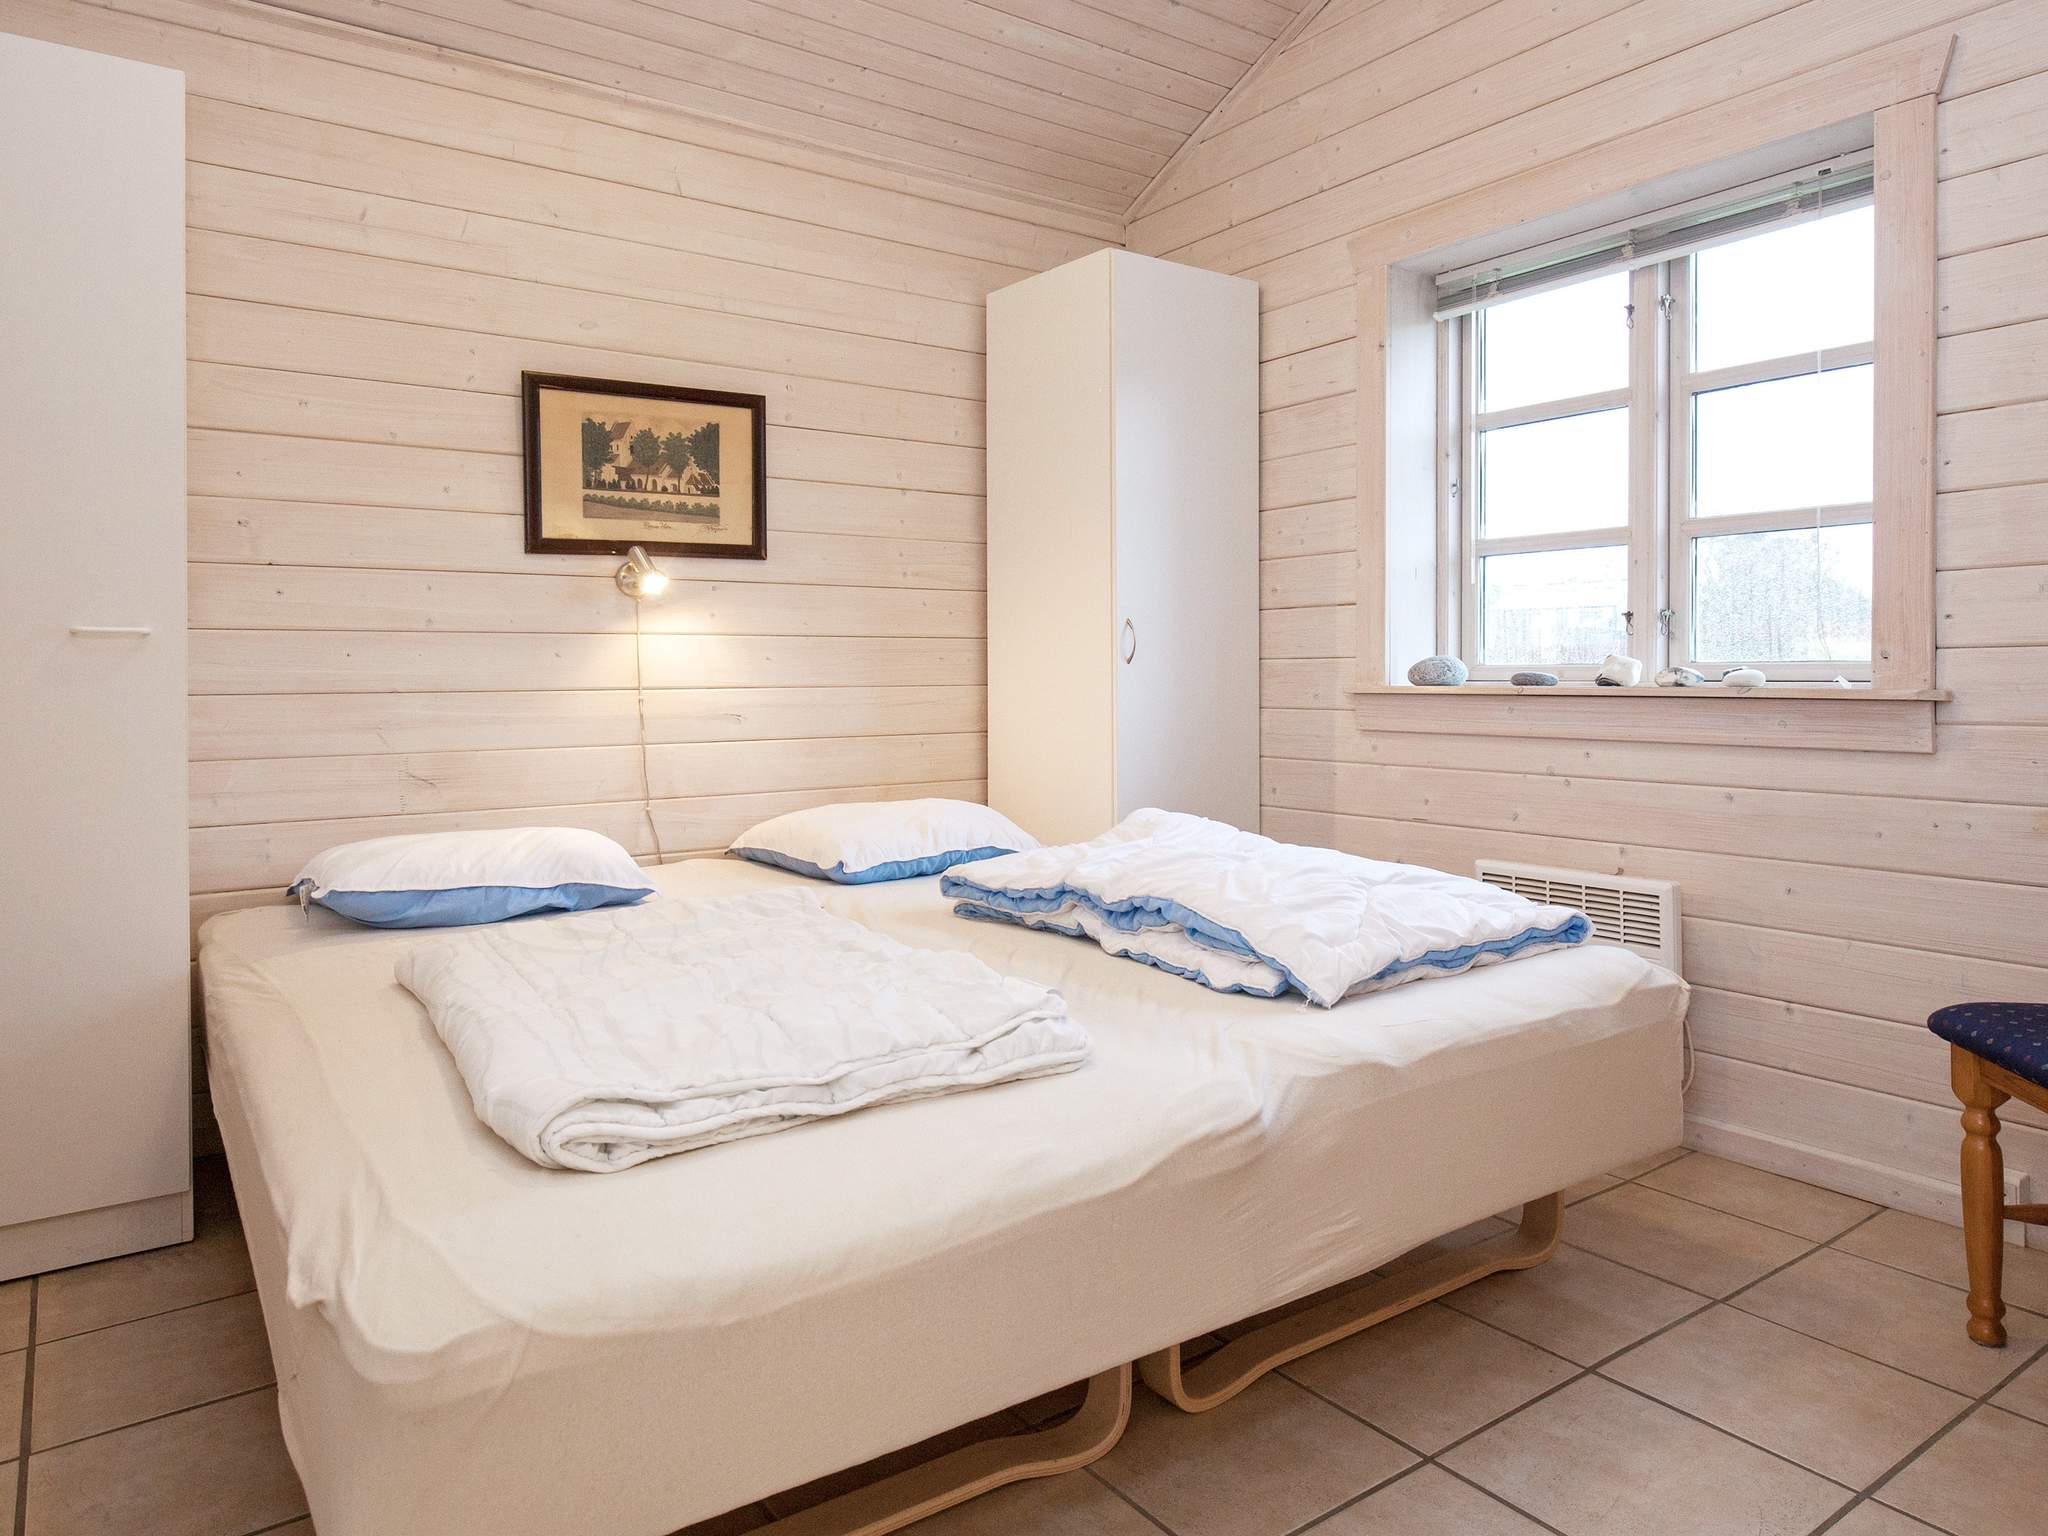 Ferienhaus Røsnæs (264063), Kalundborg, , Westseeland, Dänemark, Bild 9